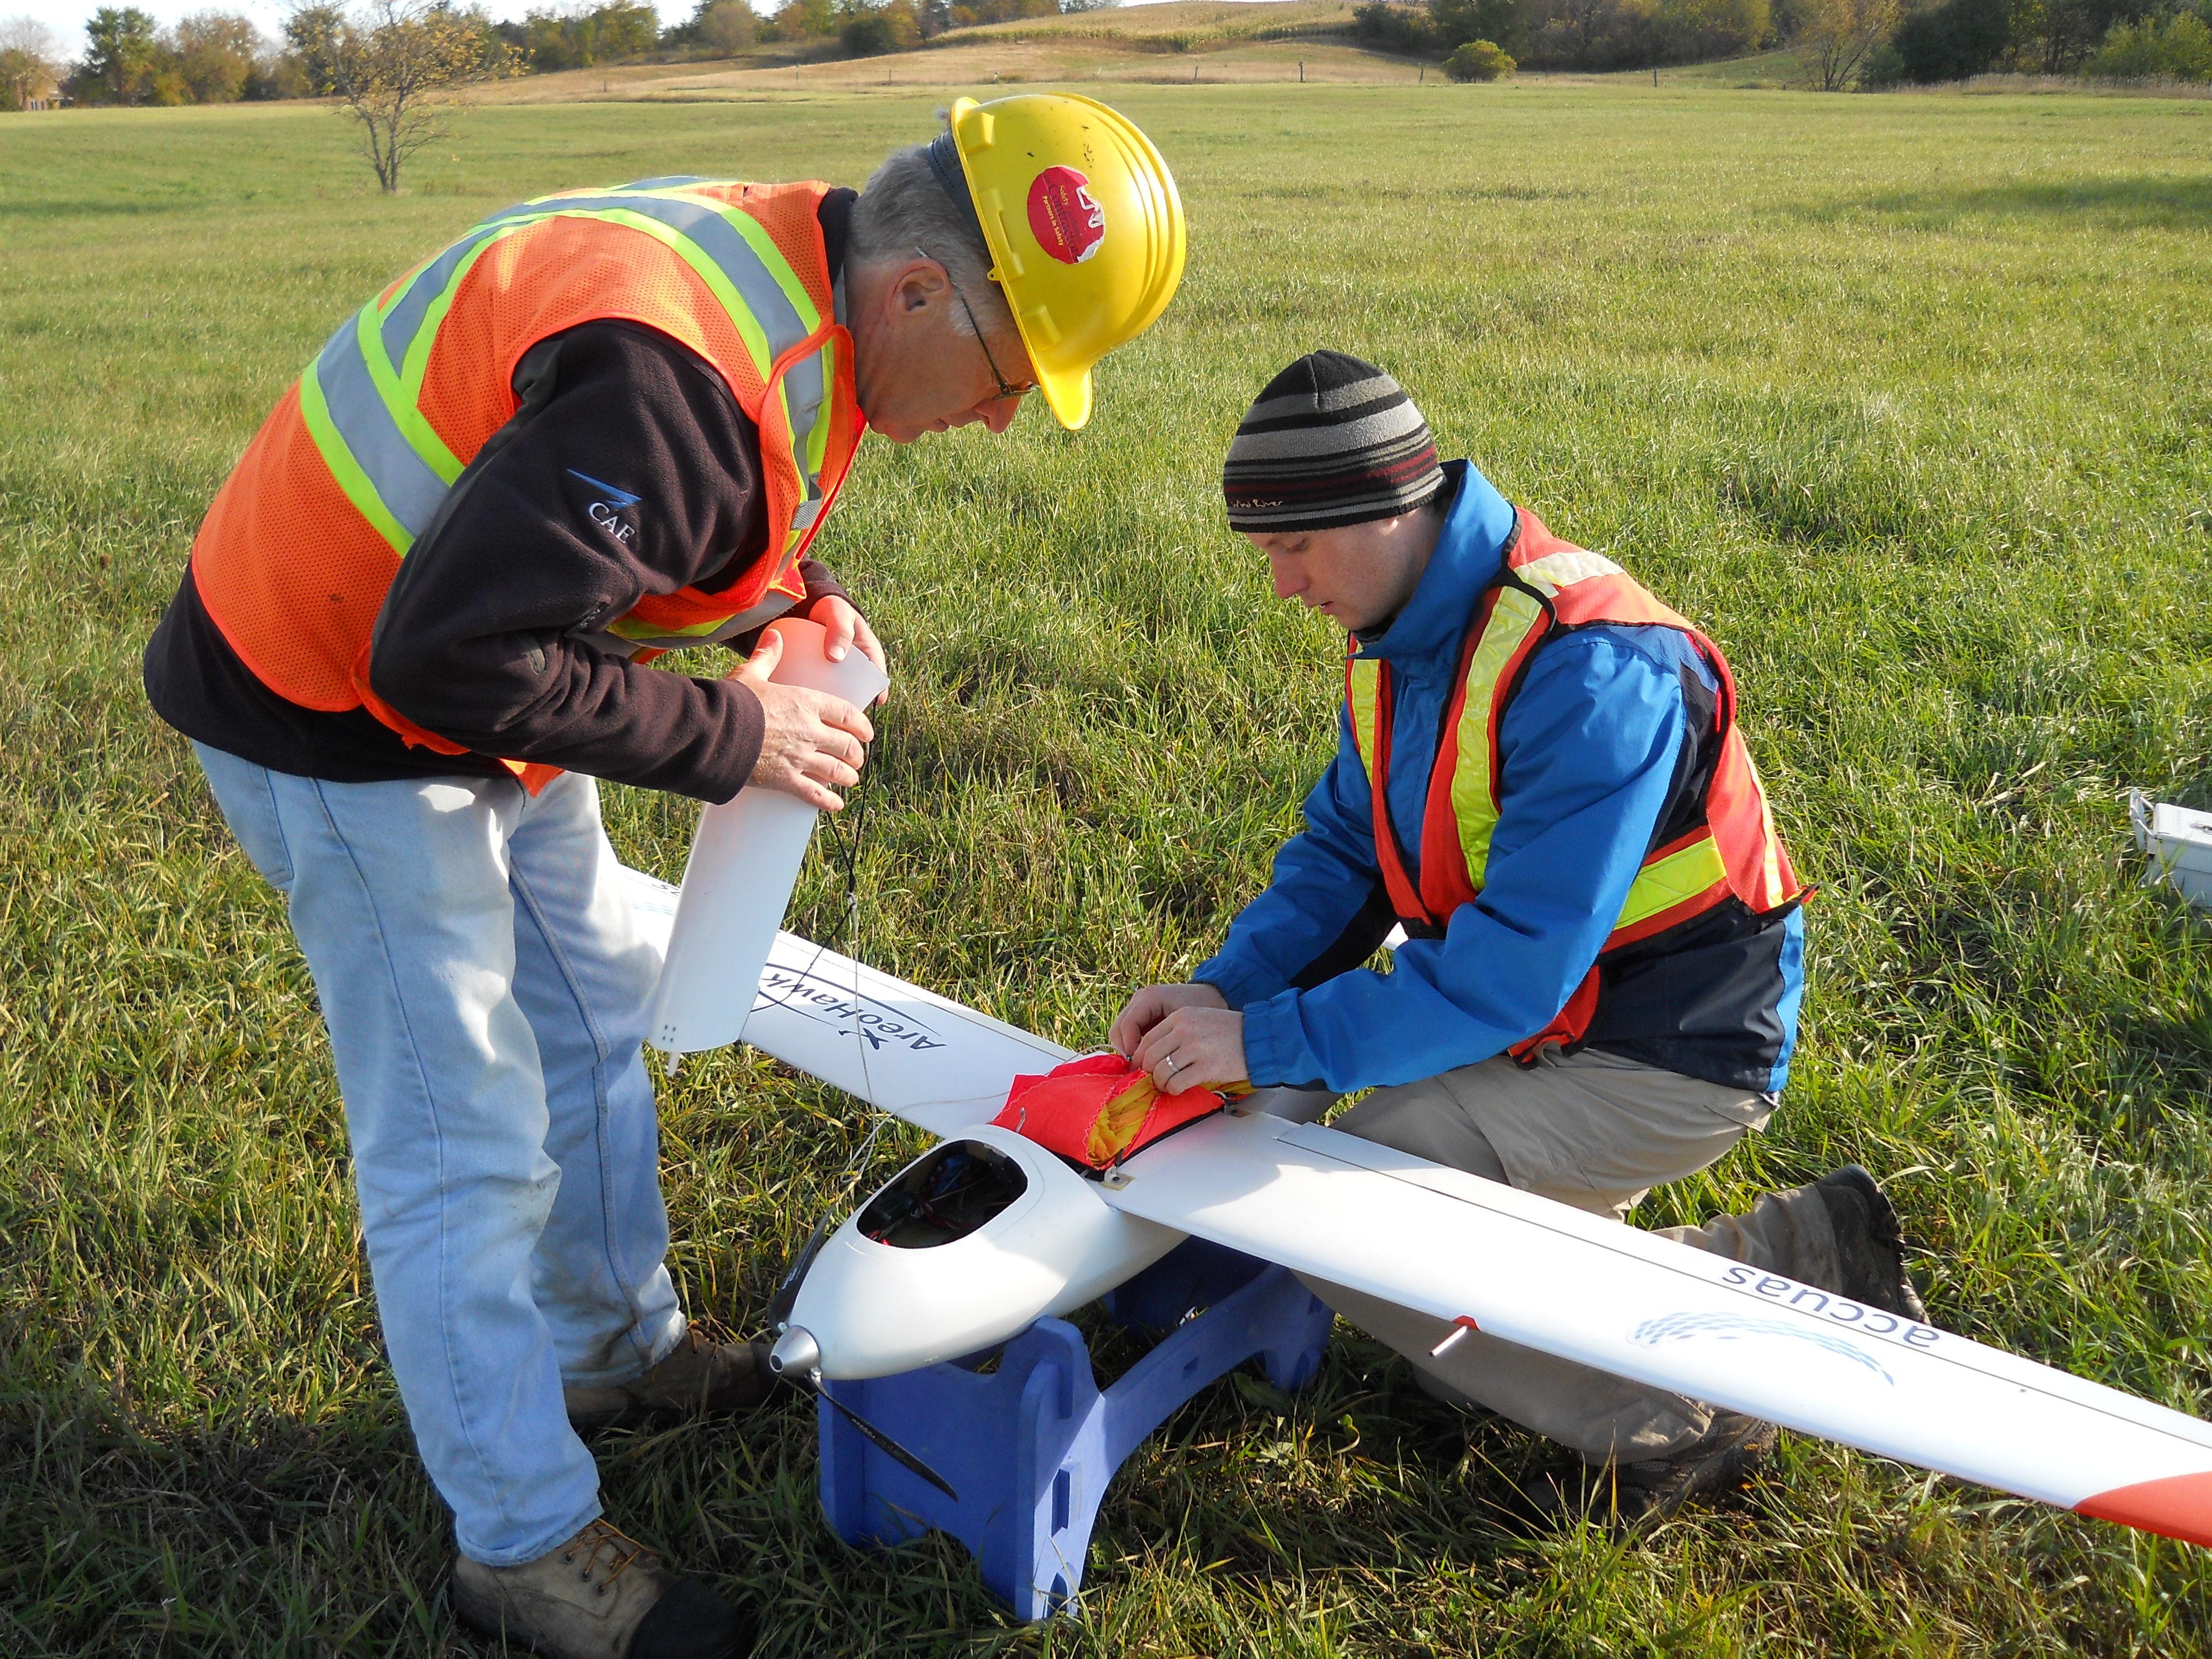 Preparing the UAV for Launch